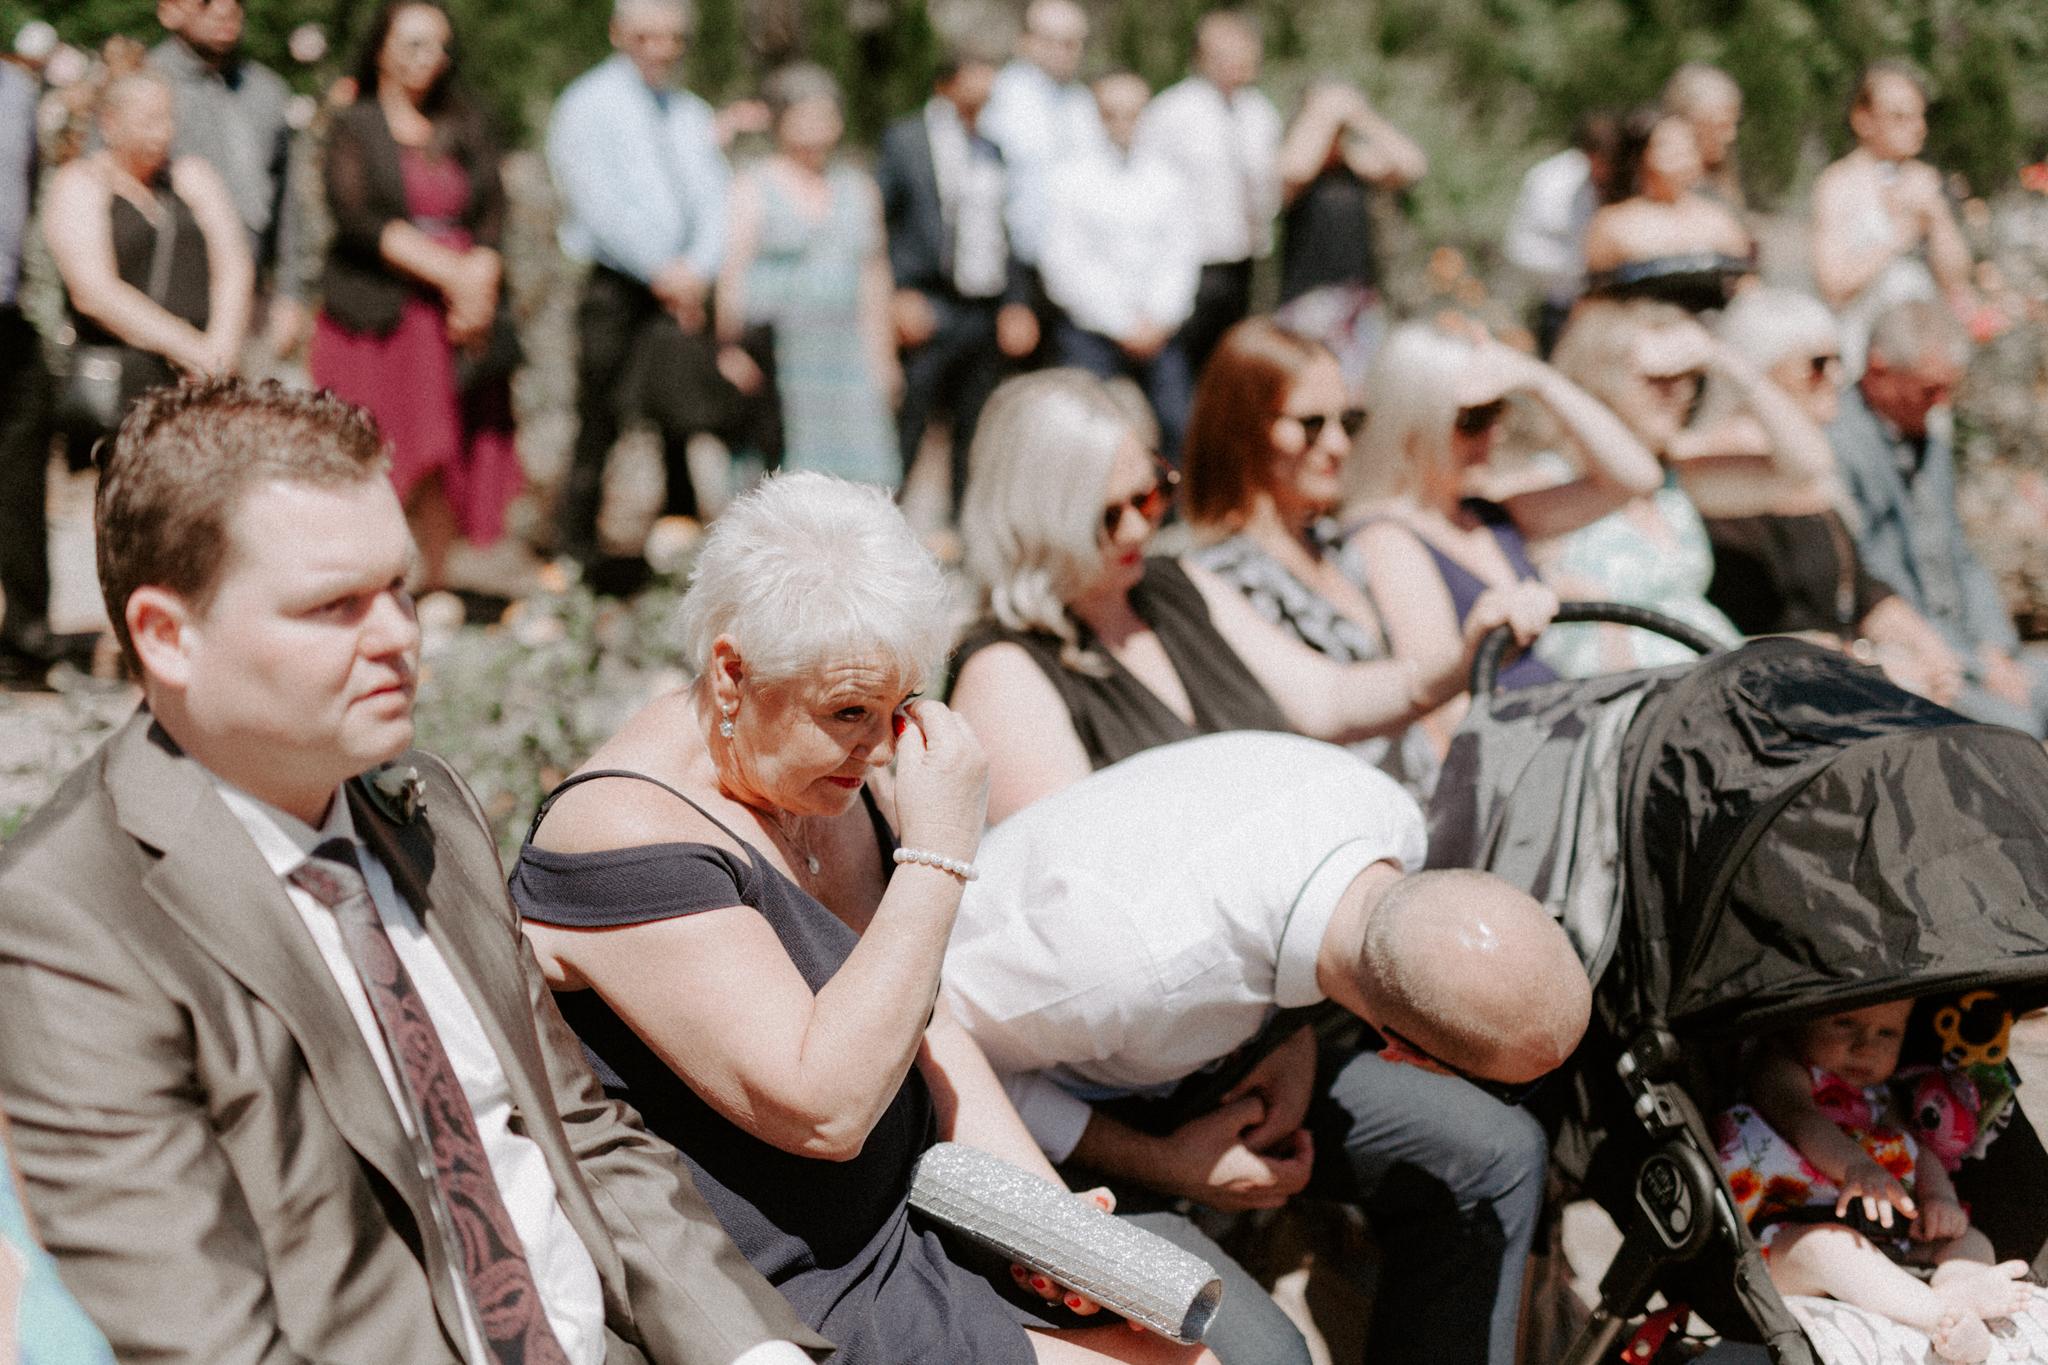 St-Kilda-Garden-Wedding-Emotions-and-Math-Photograph-054.jpg